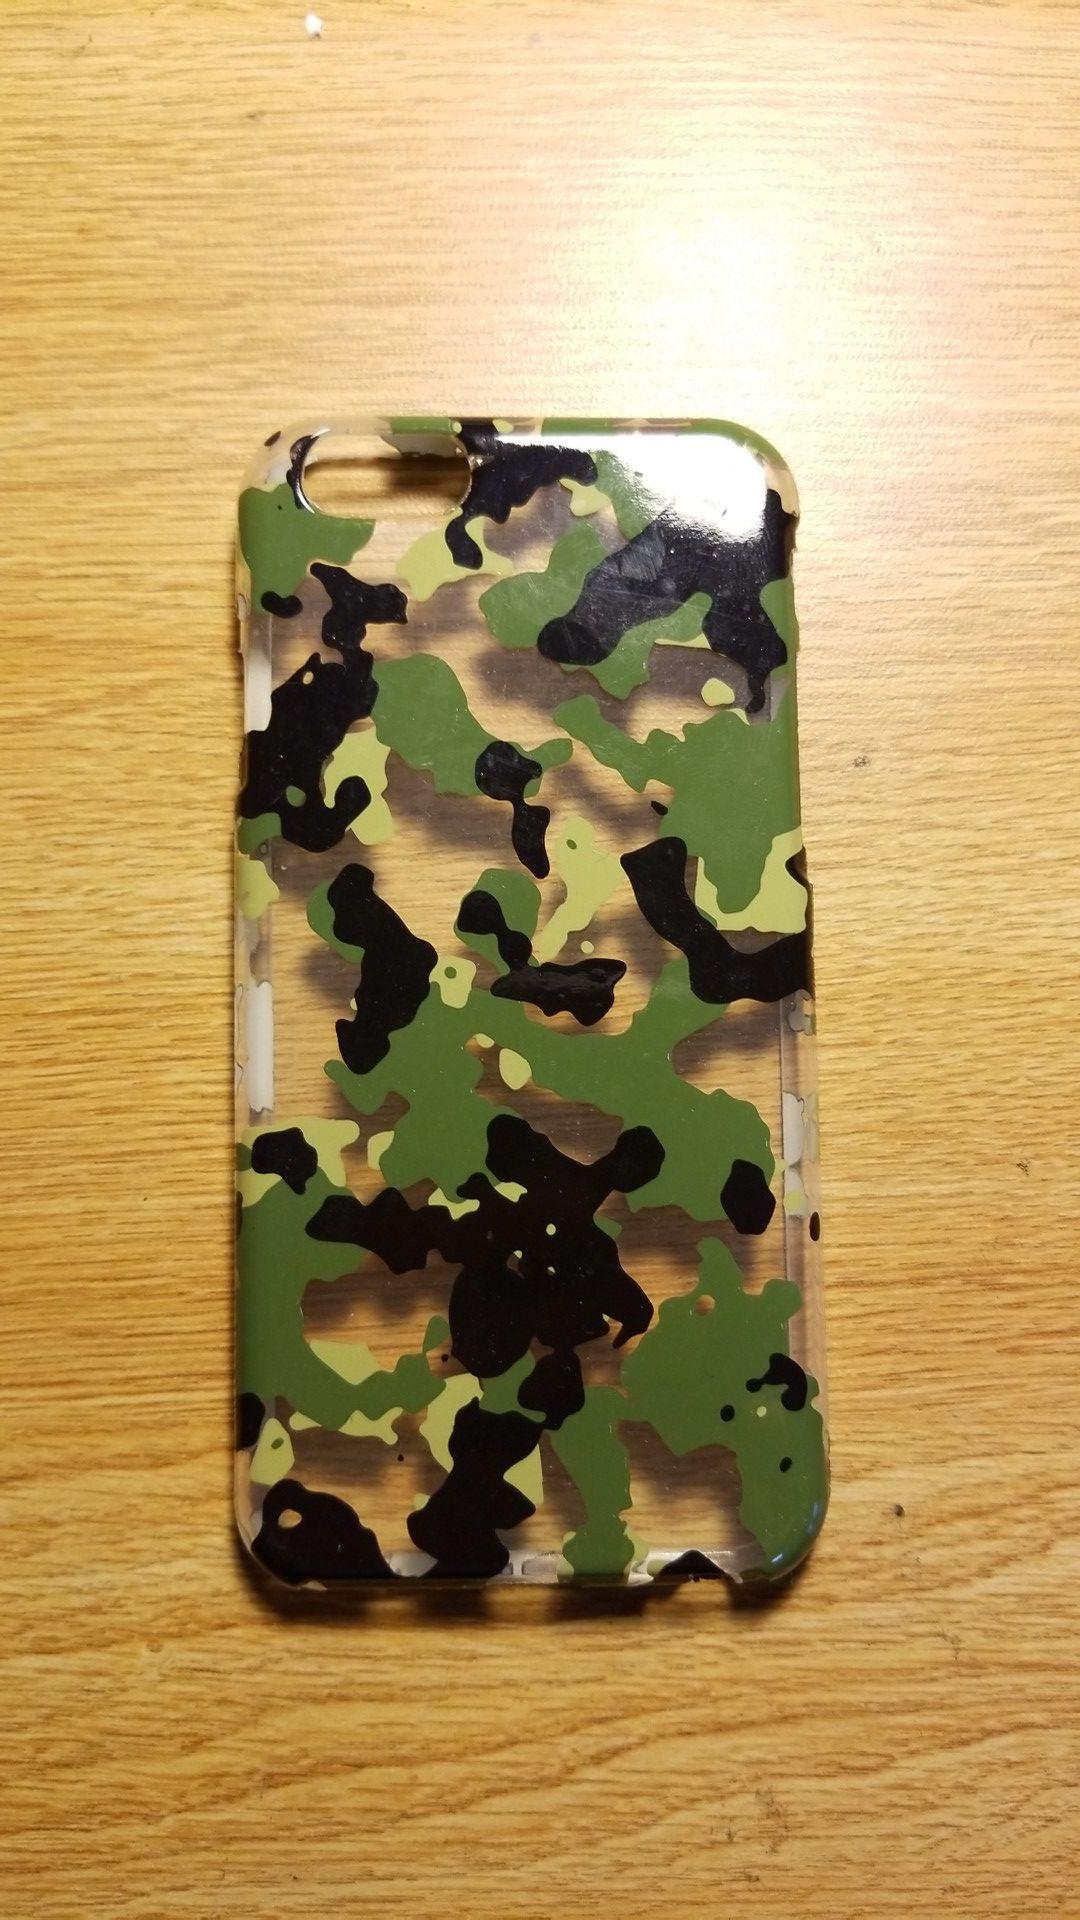 Camo phone case